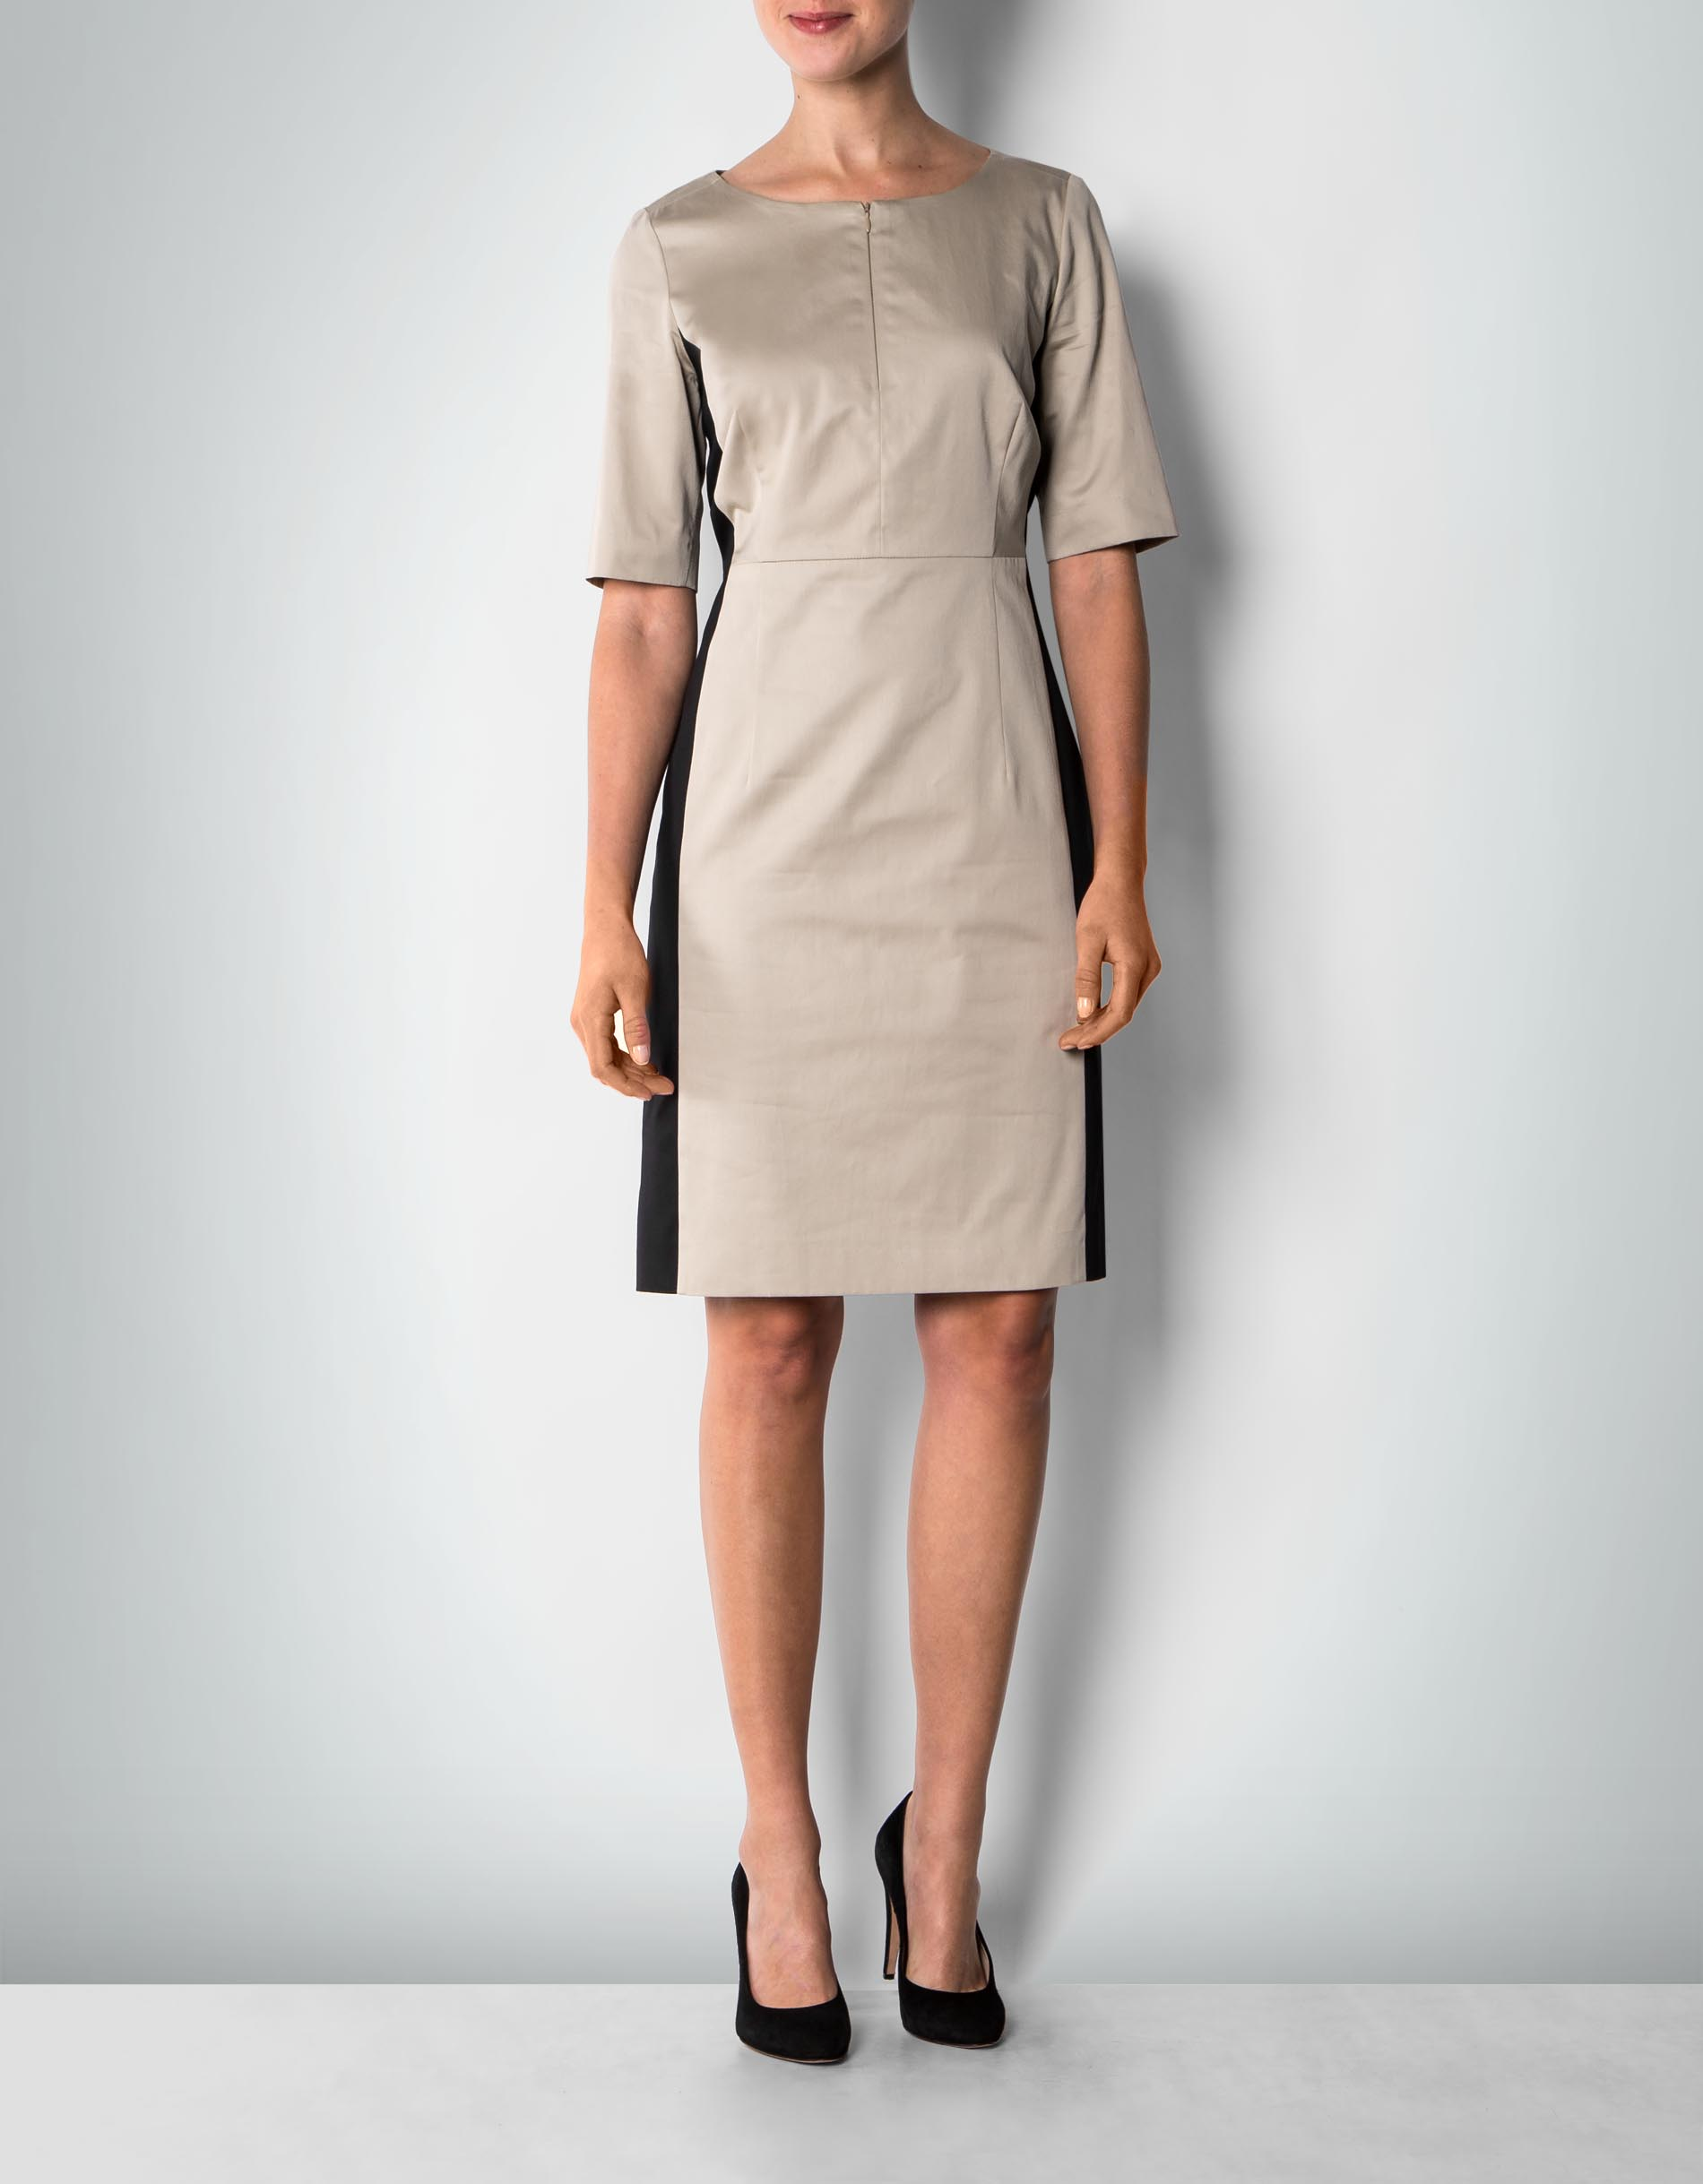 daniel hechter damen kleid beige etui im two tone look. Black Bedroom Furniture Sets. Home Design Ideas